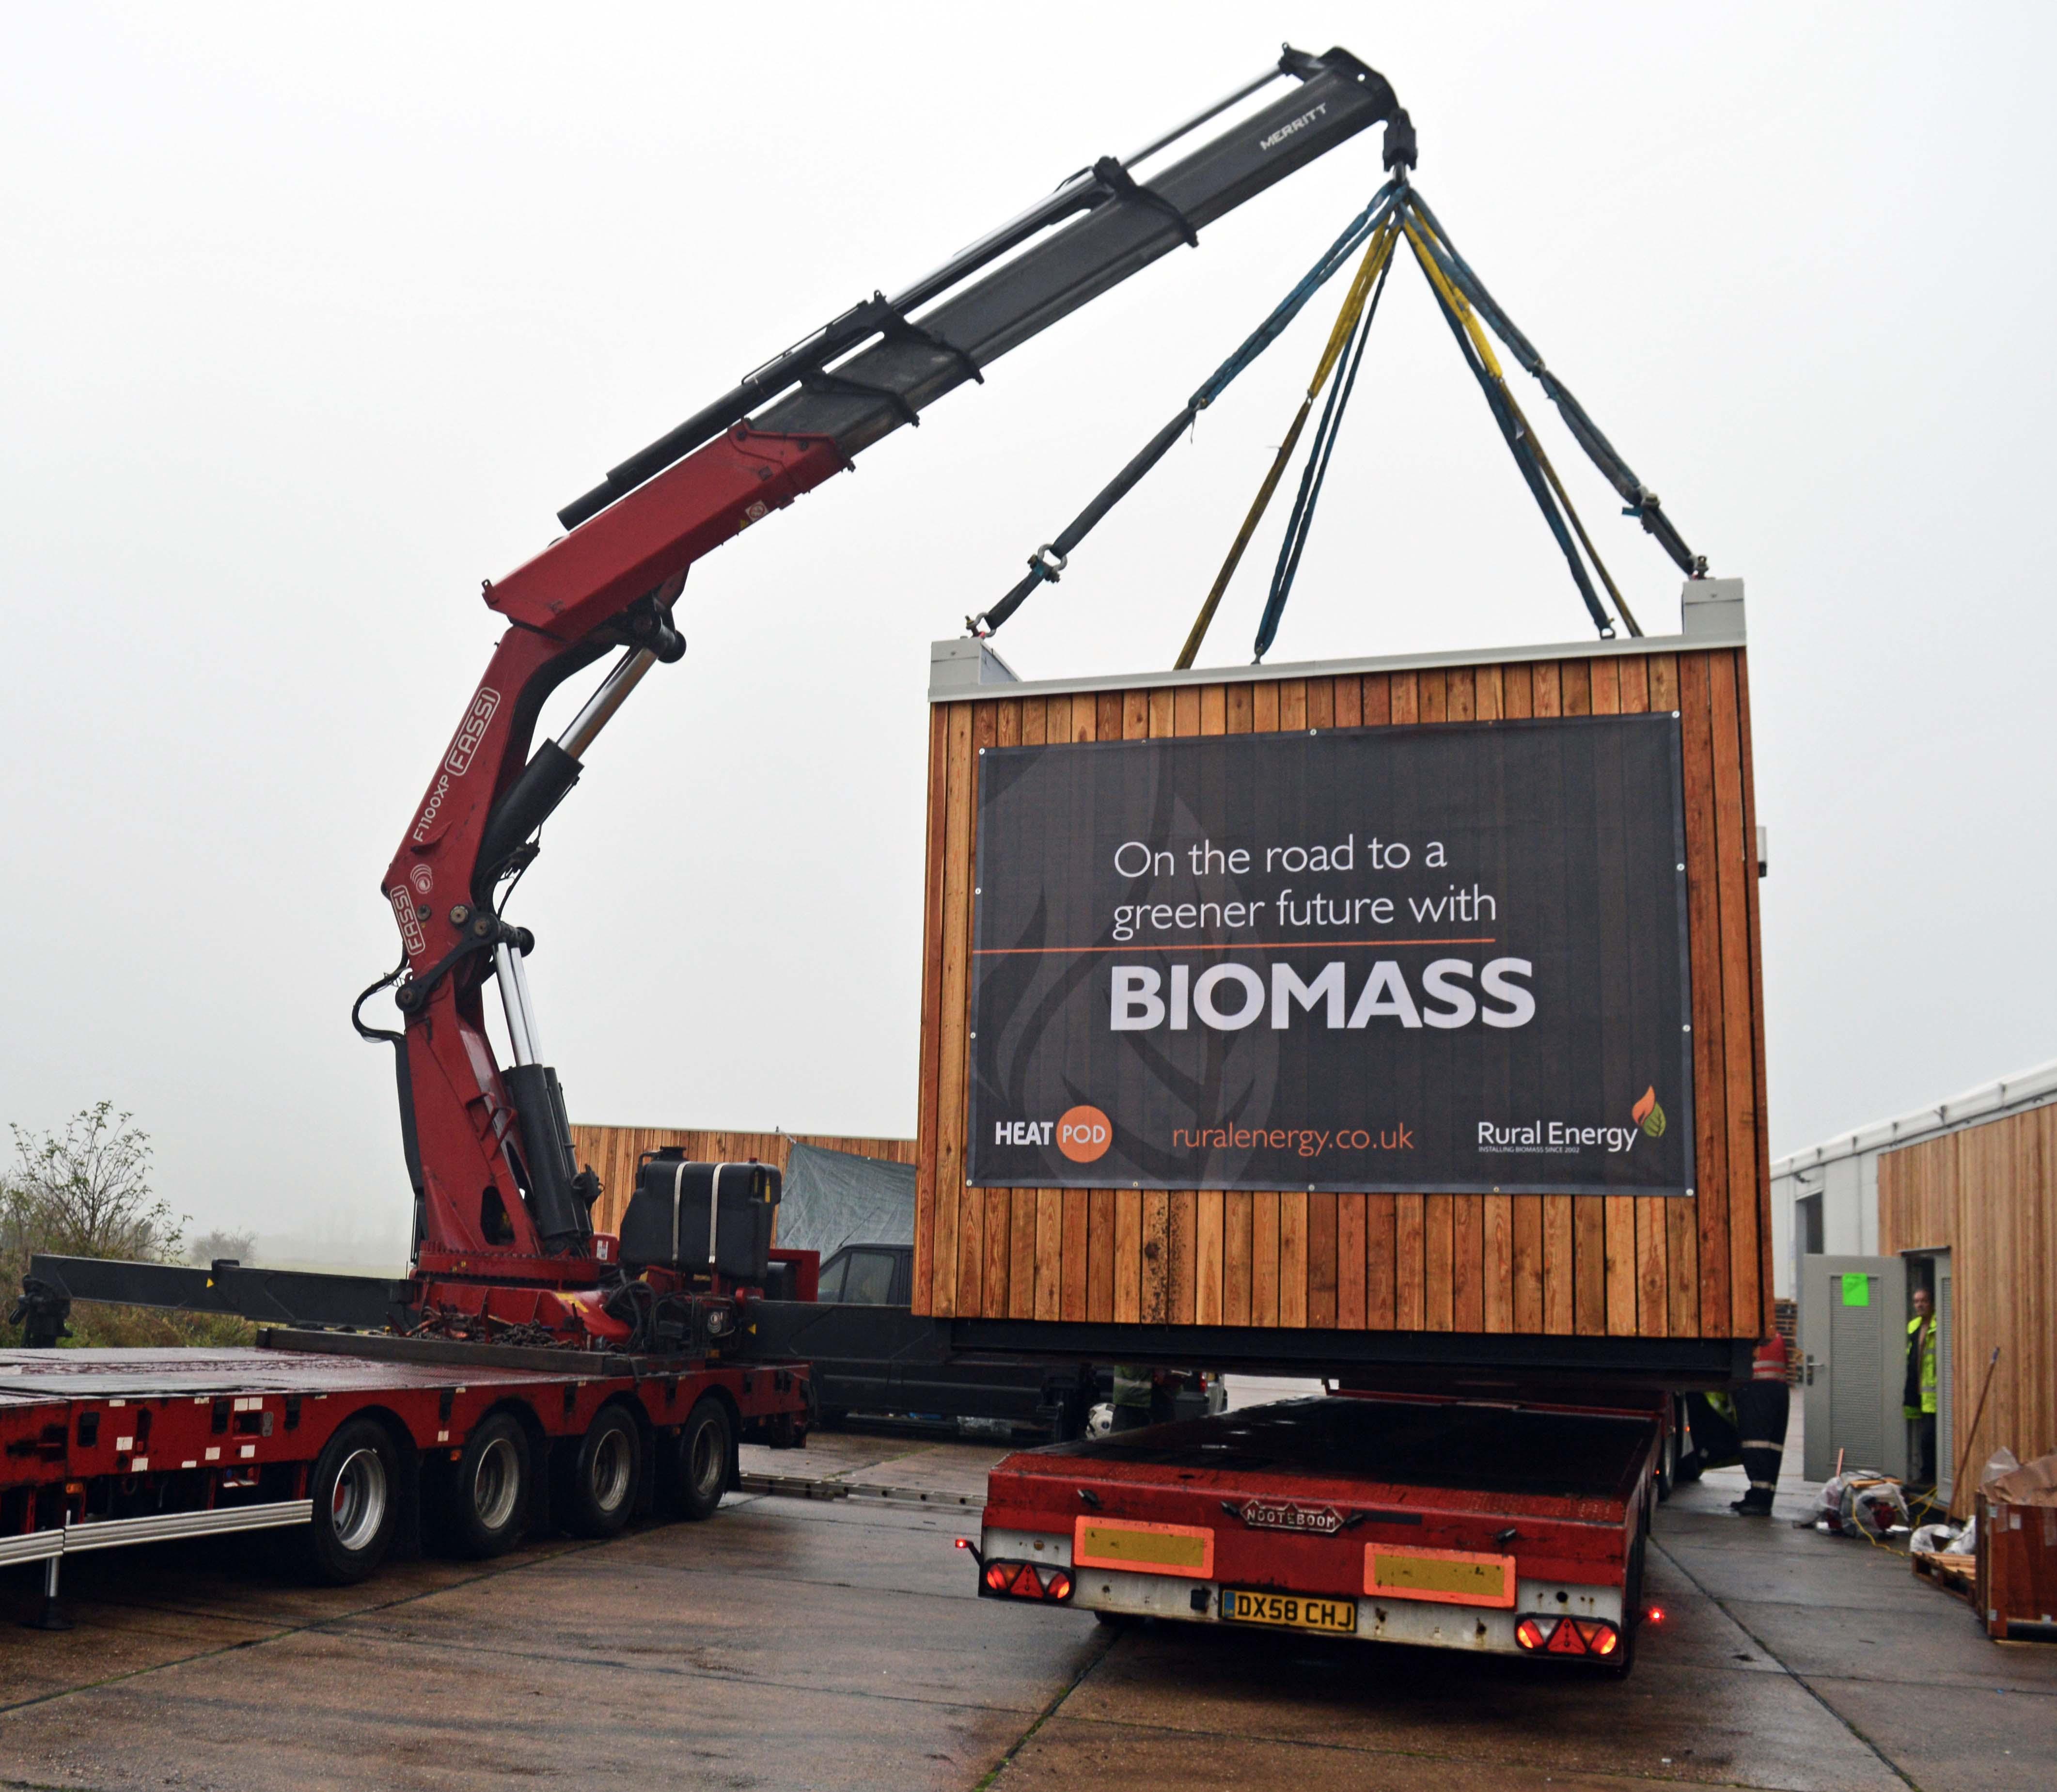 Buckinghamshire County Council Biomass Framework